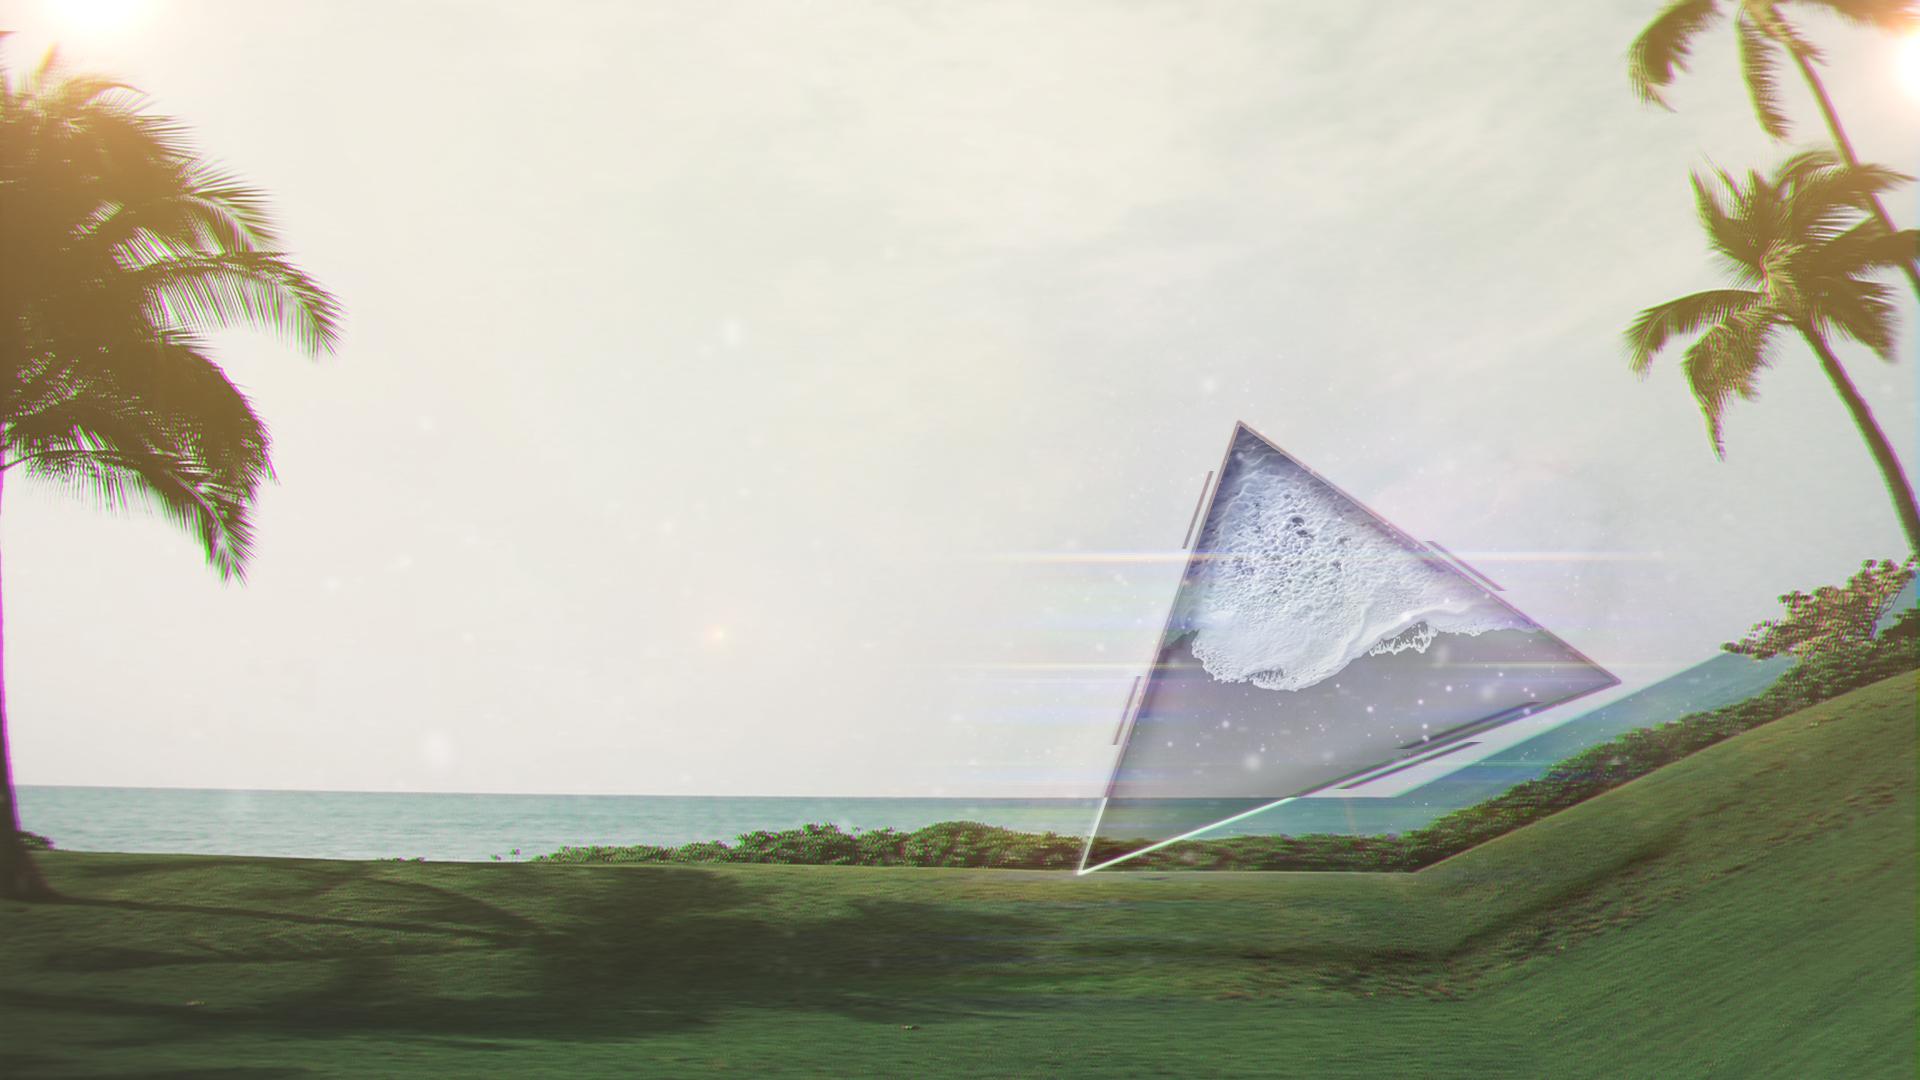 Wallpaper : sunlight, landscape, lights, painting, Photoshop, sea